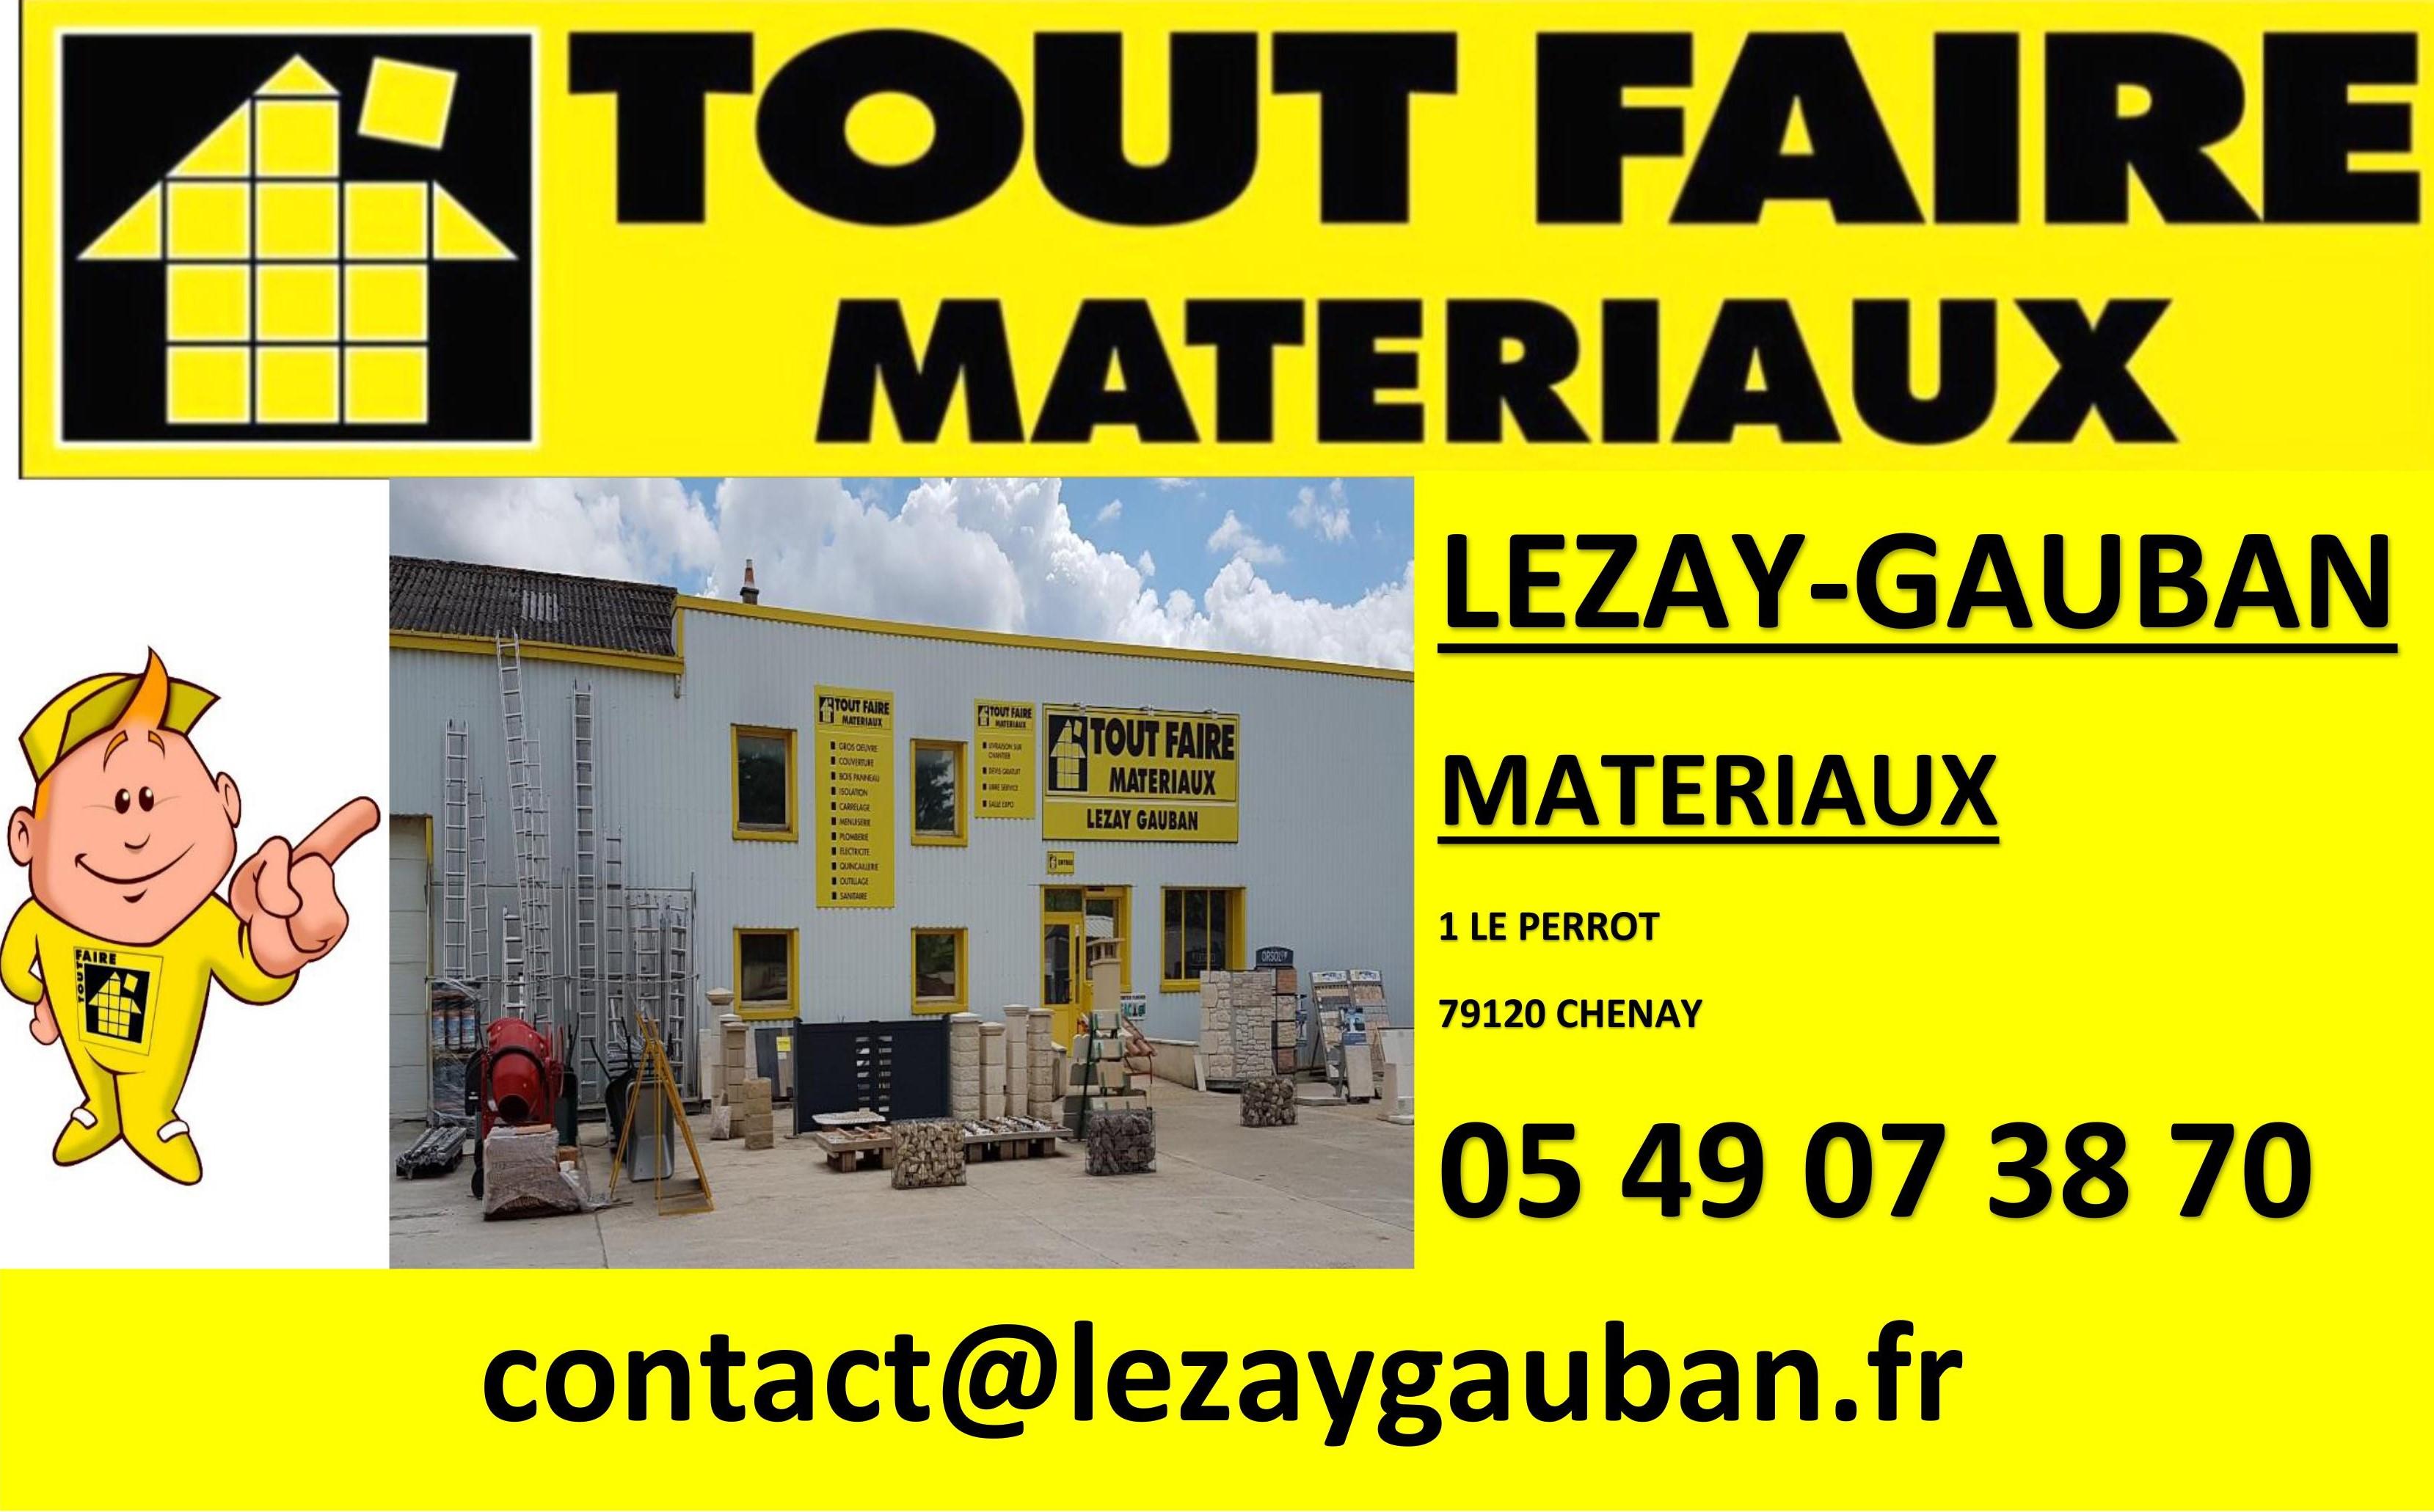 lezay gauban